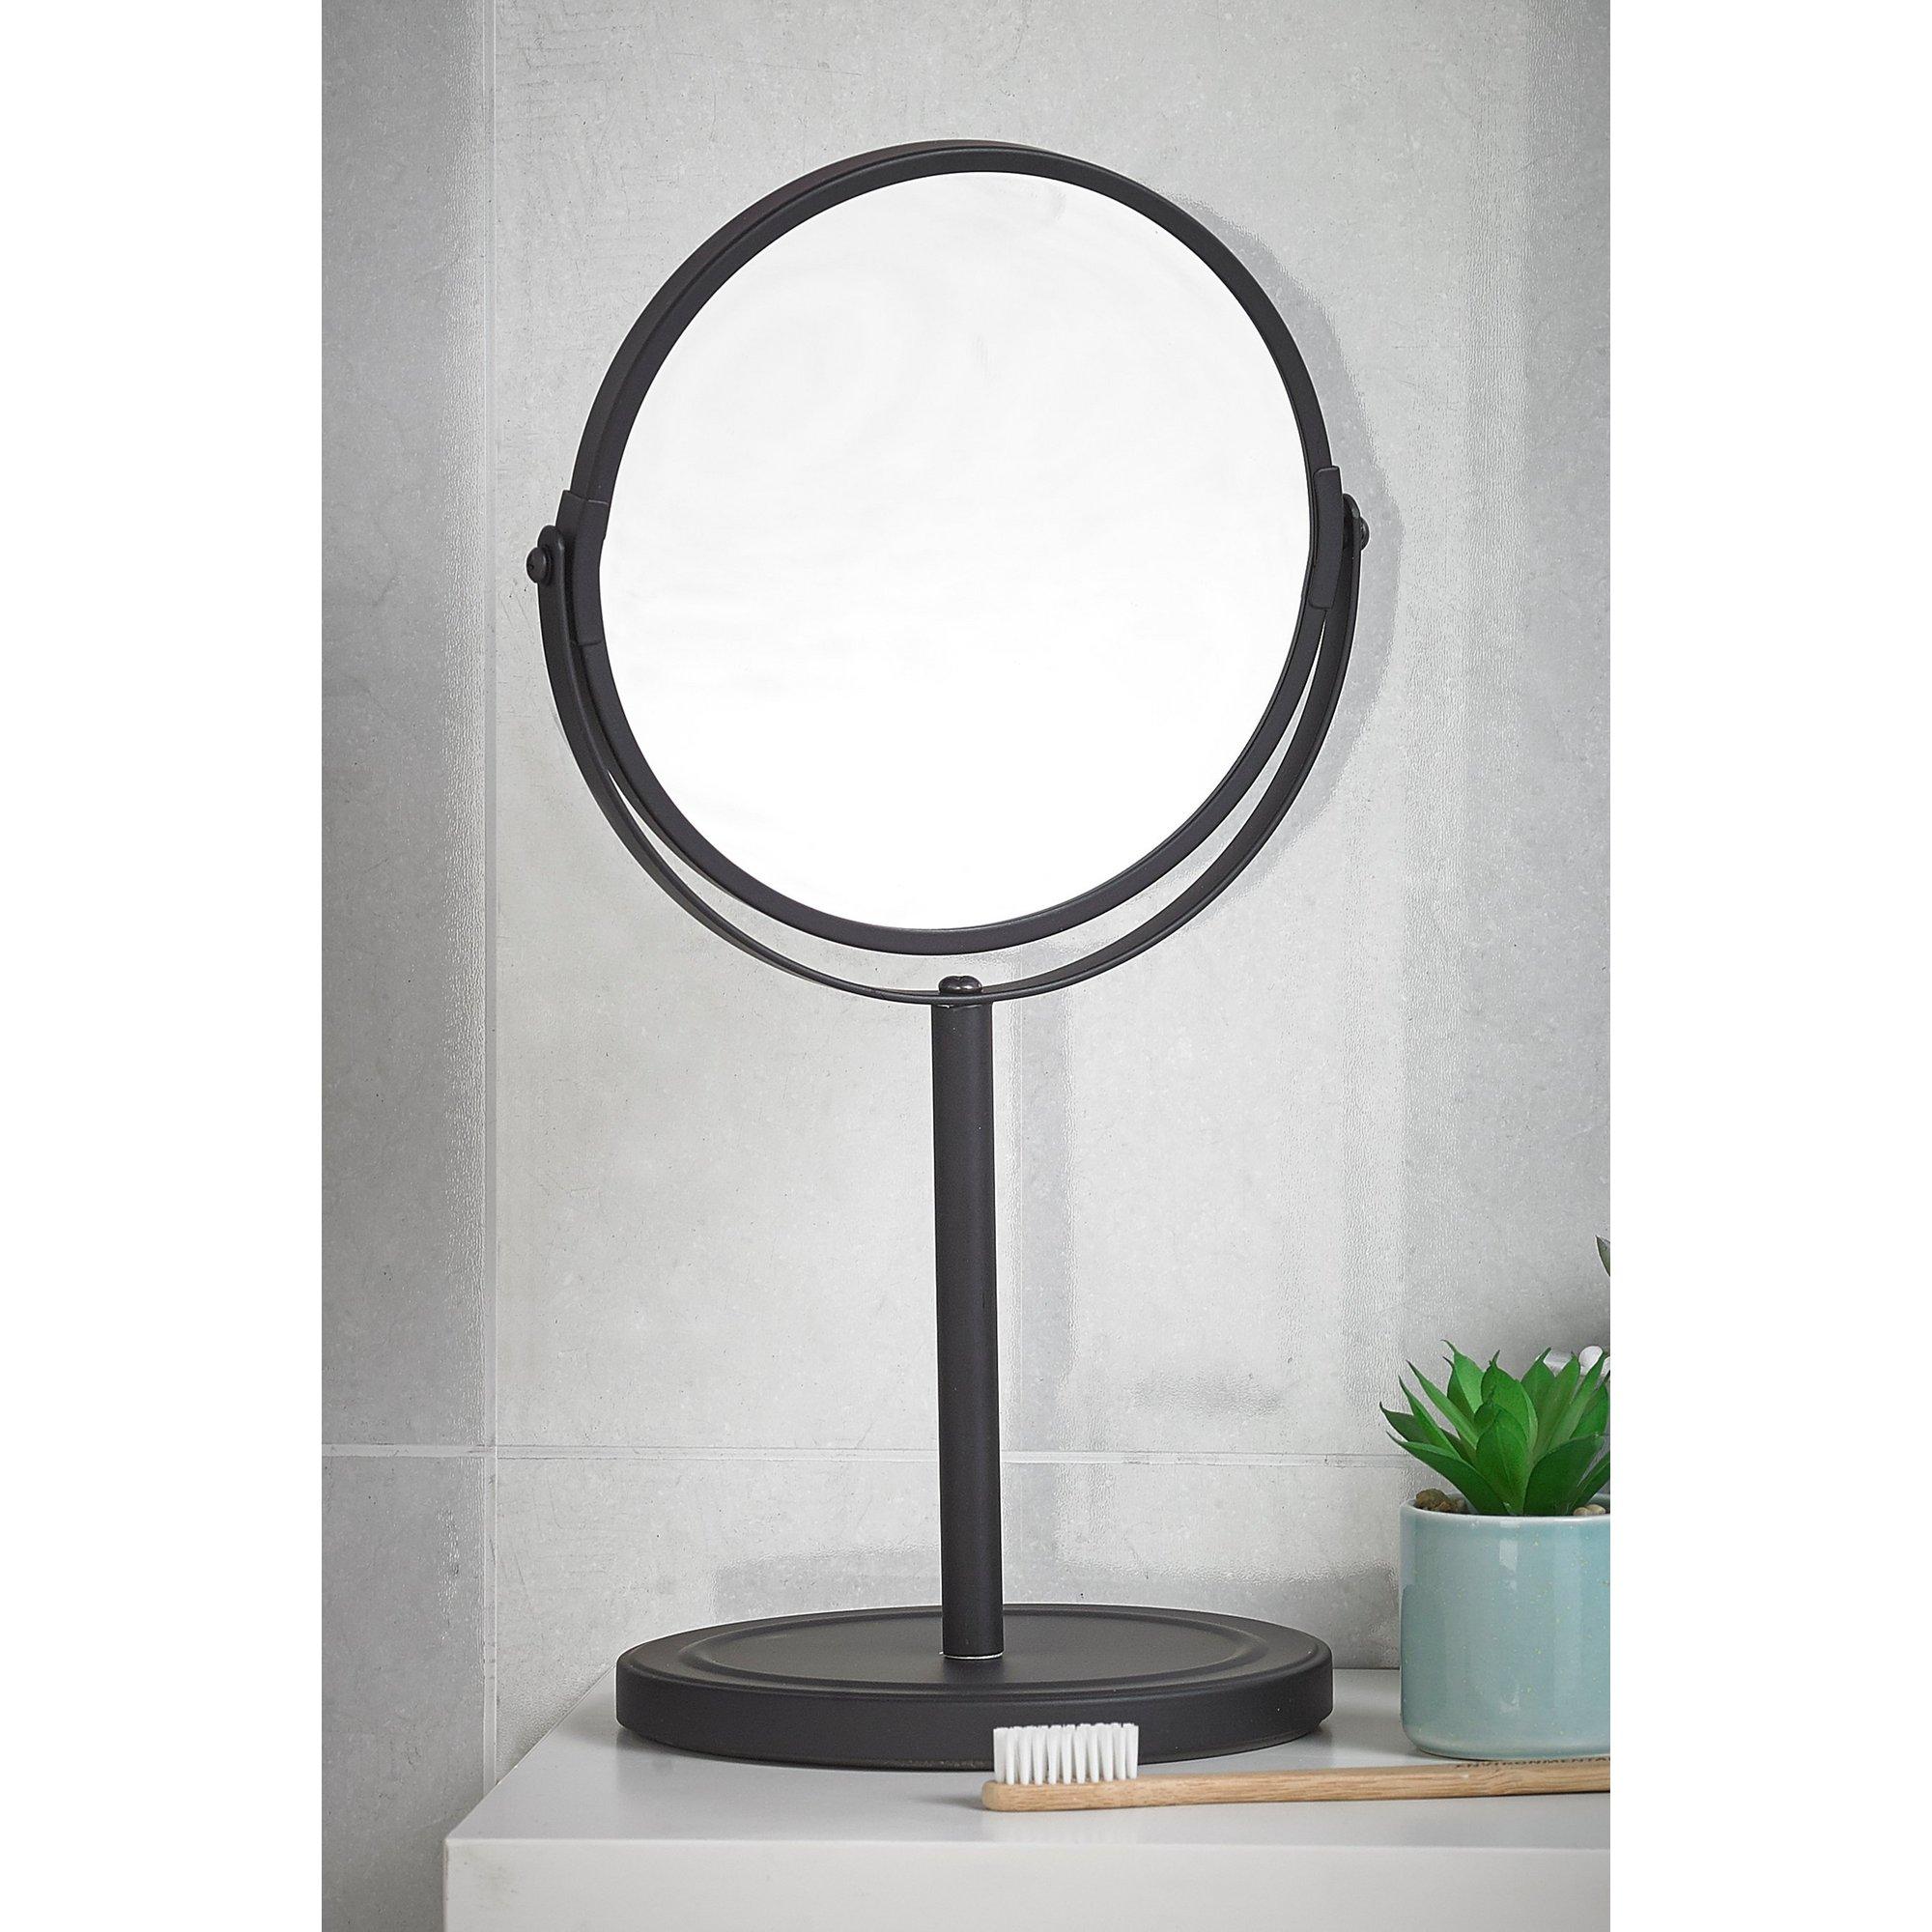 Image of ROMA Bathroom Pedestal Mirror